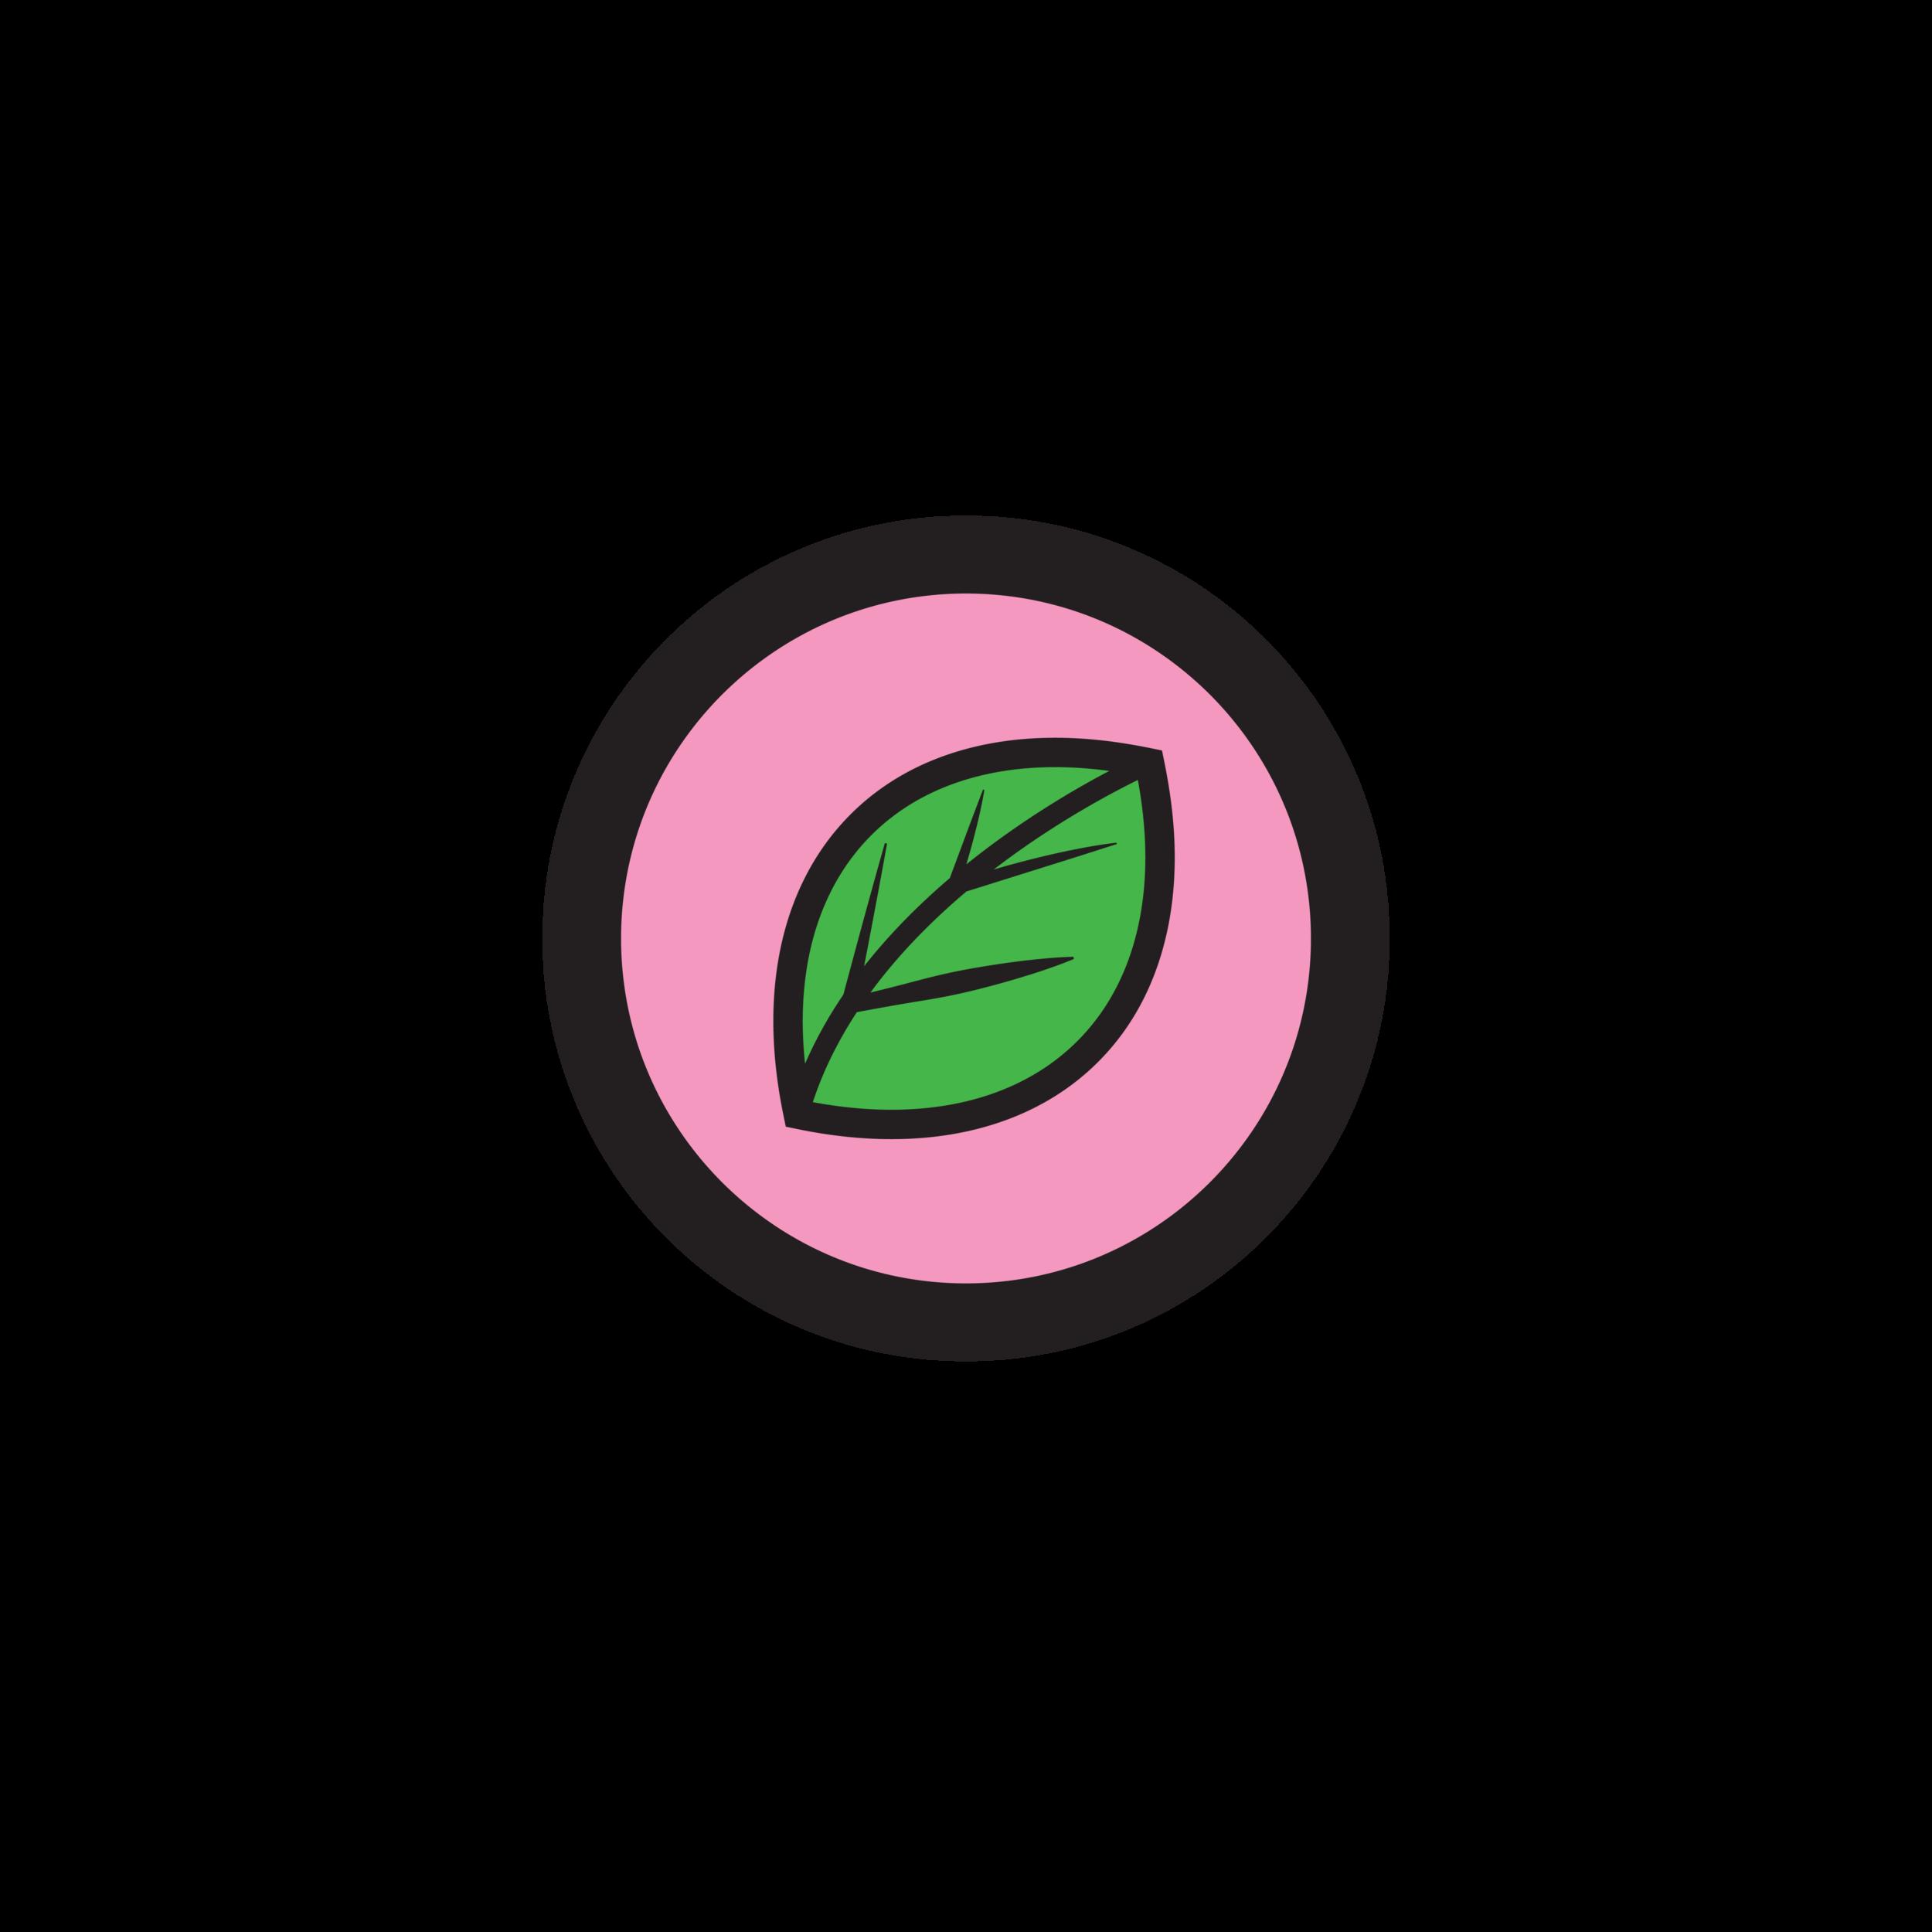 Logo by Matthew bloomer.